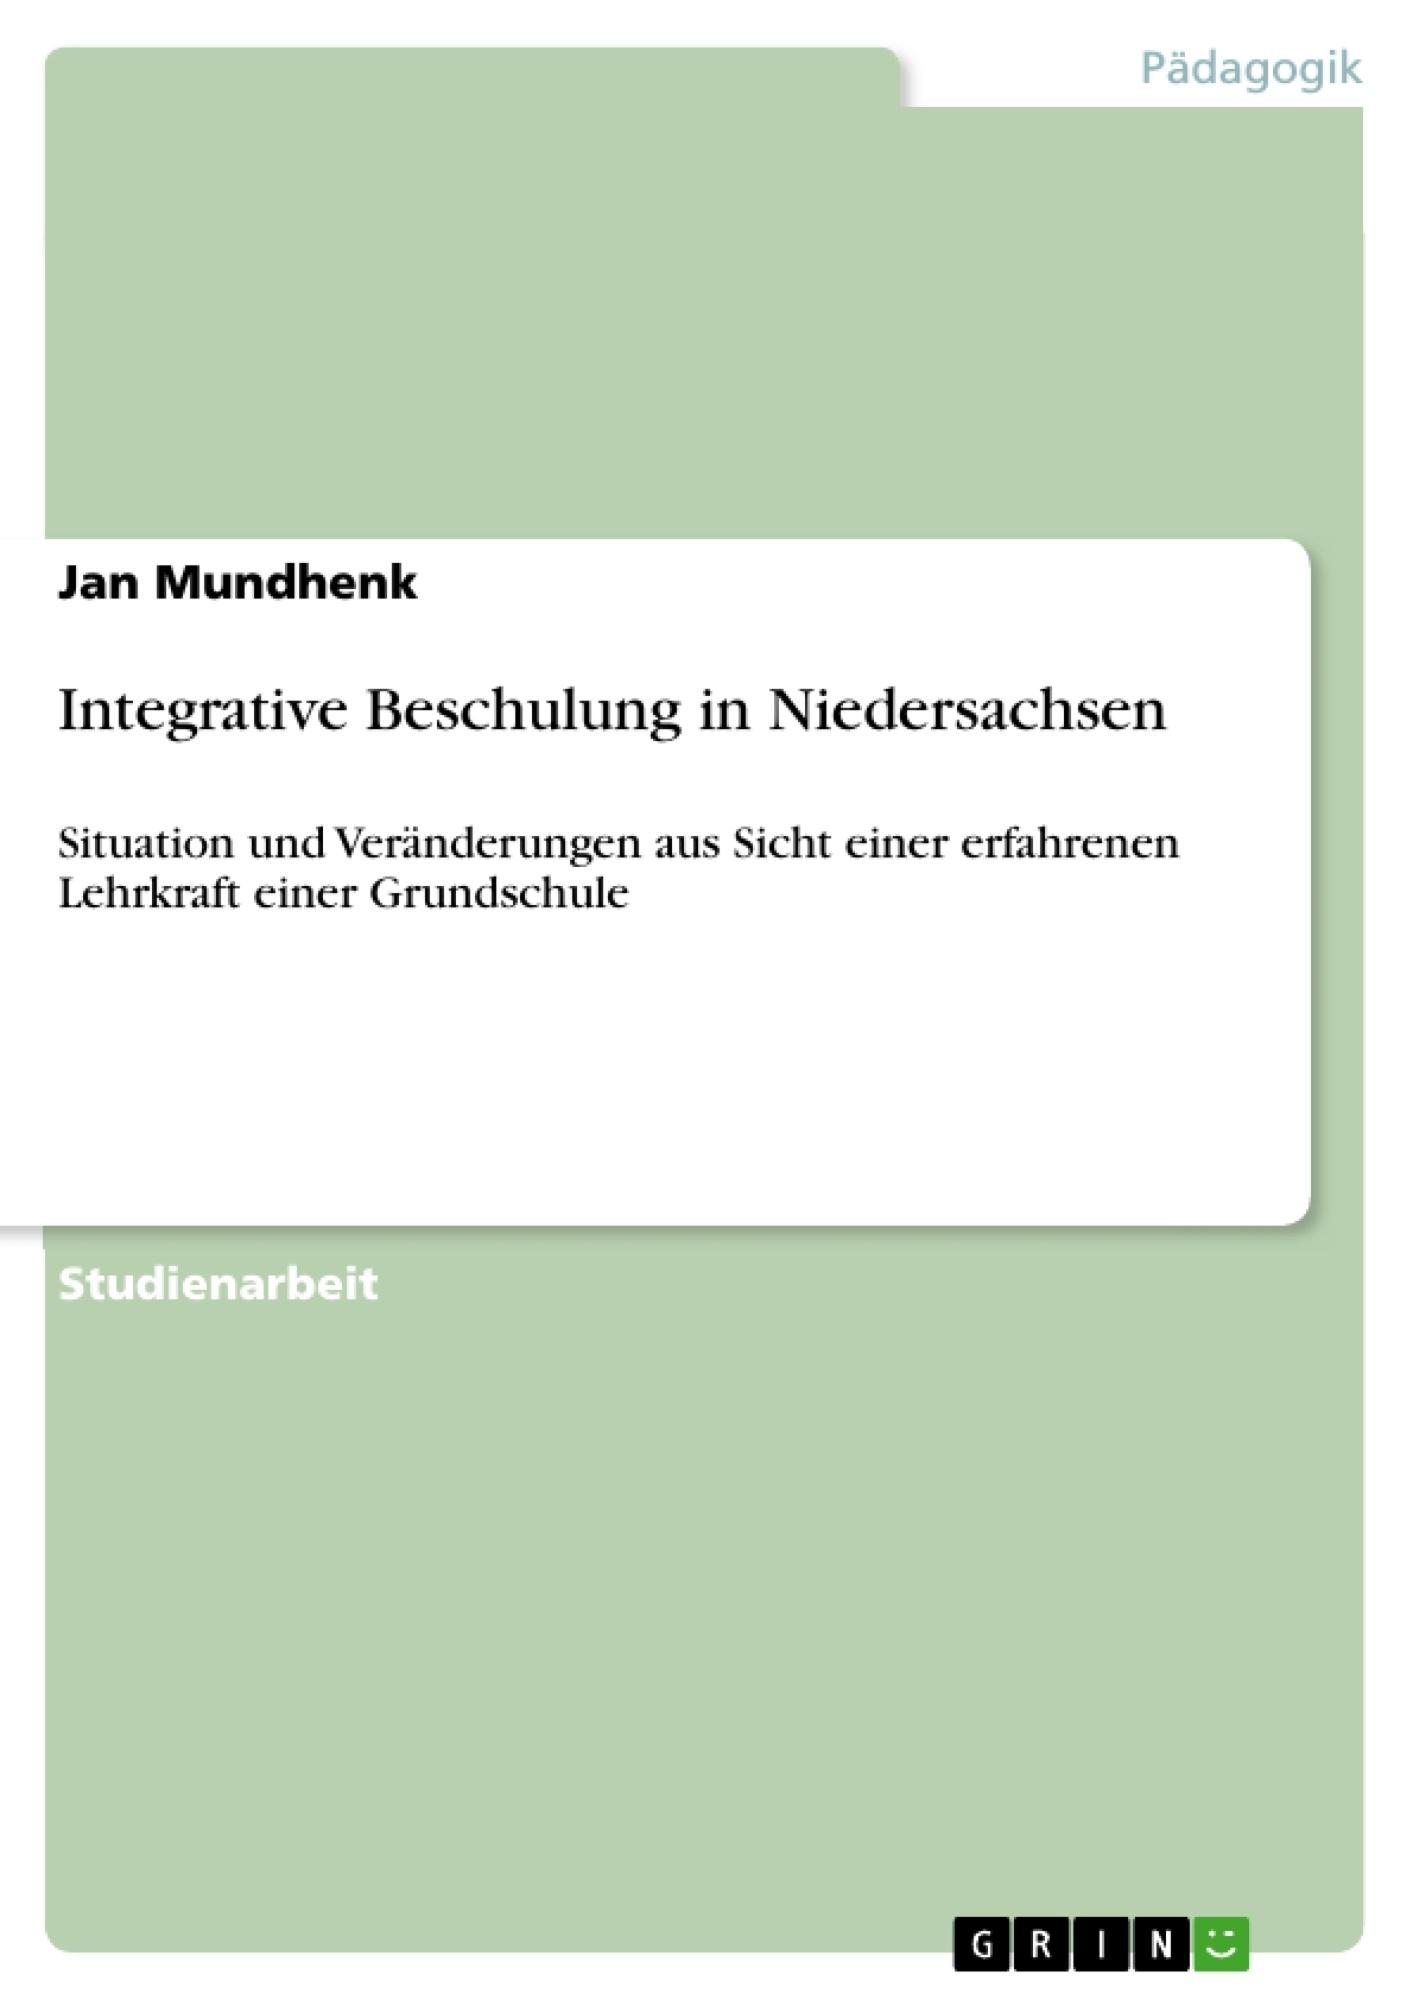 Titel: Integrative Beschulung in Niedersachsen